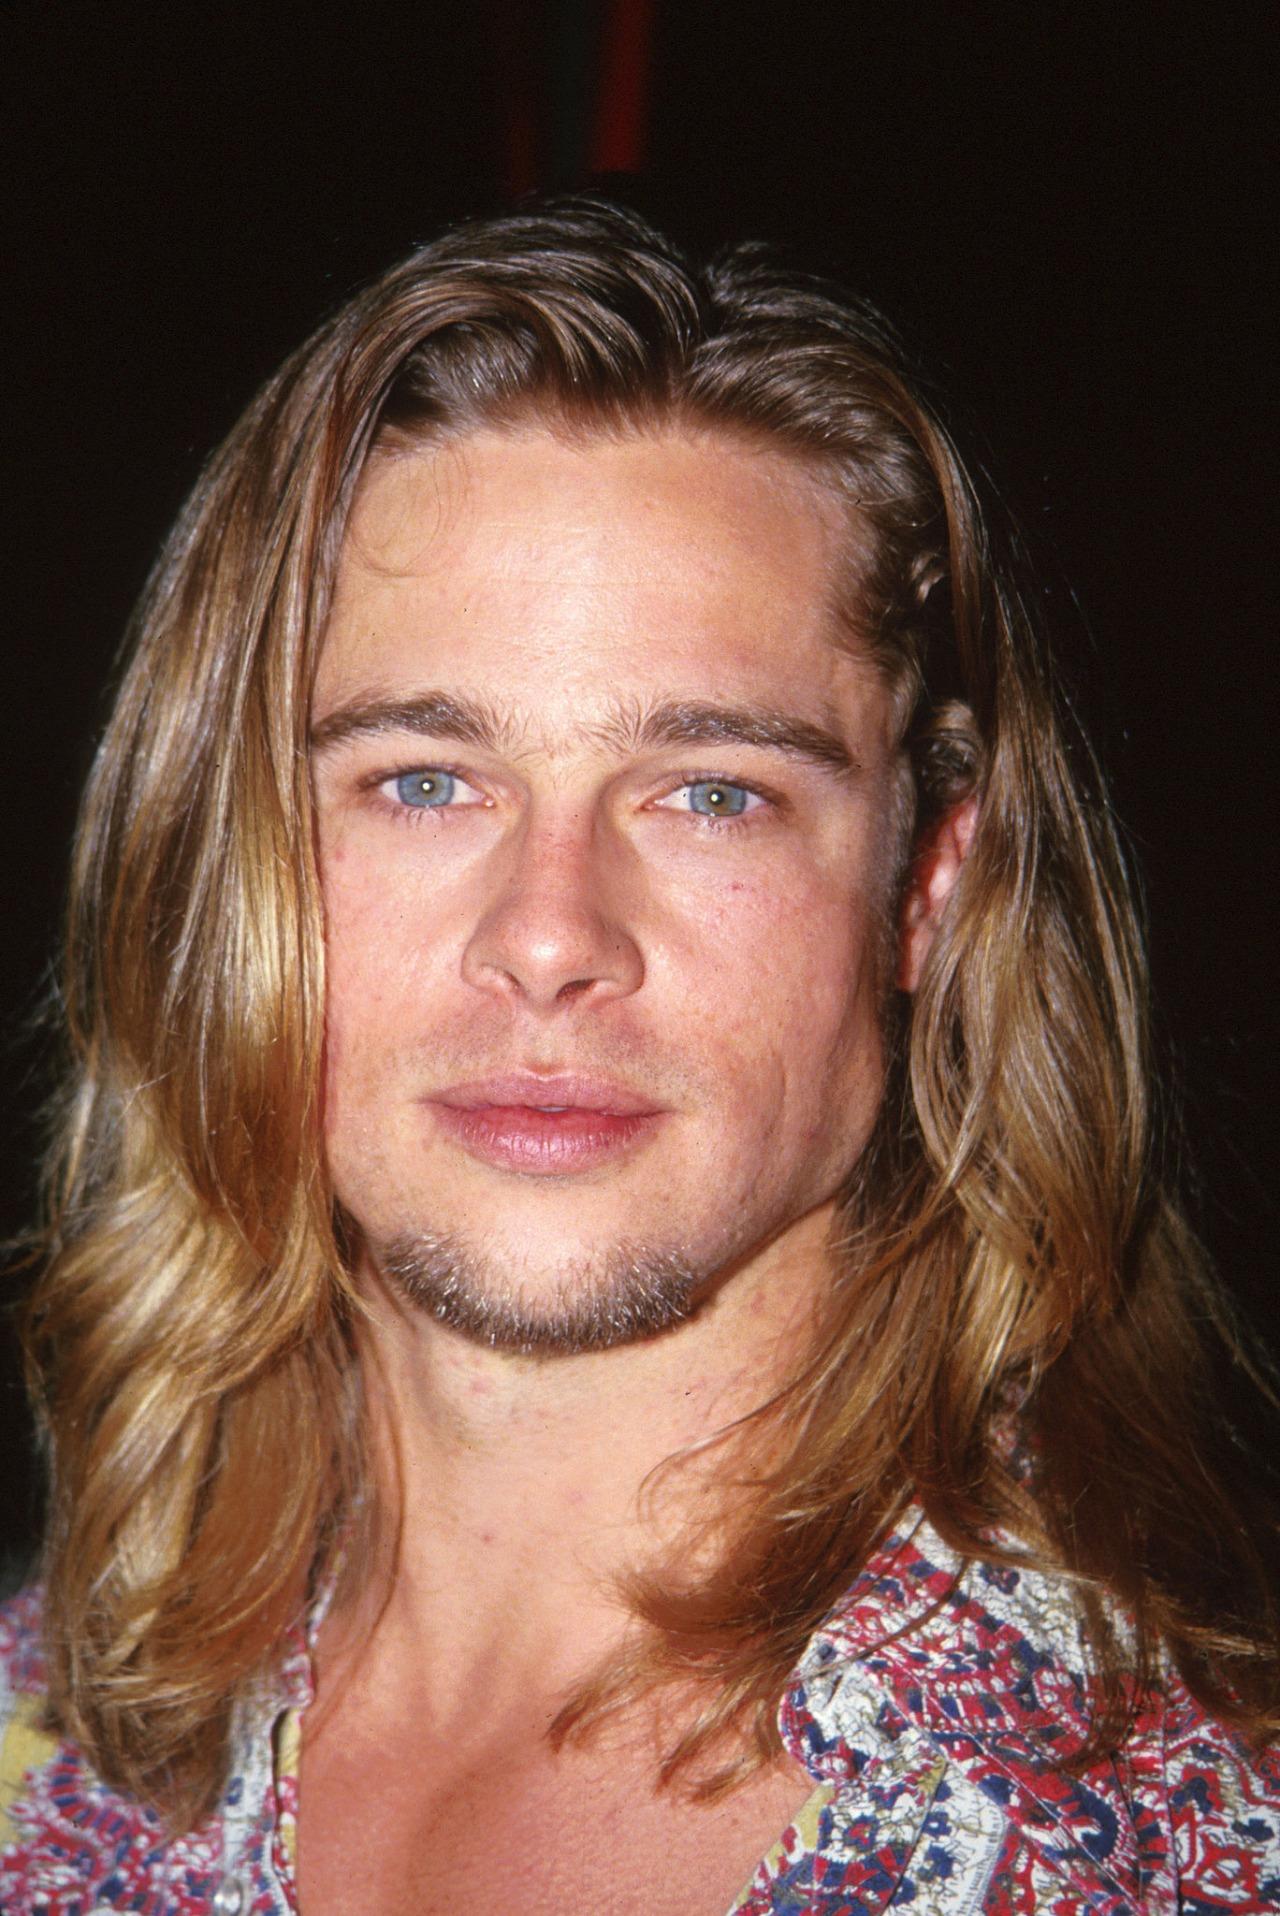 Brad Pitt 1980s Matthew S Island Of Misfit Toys